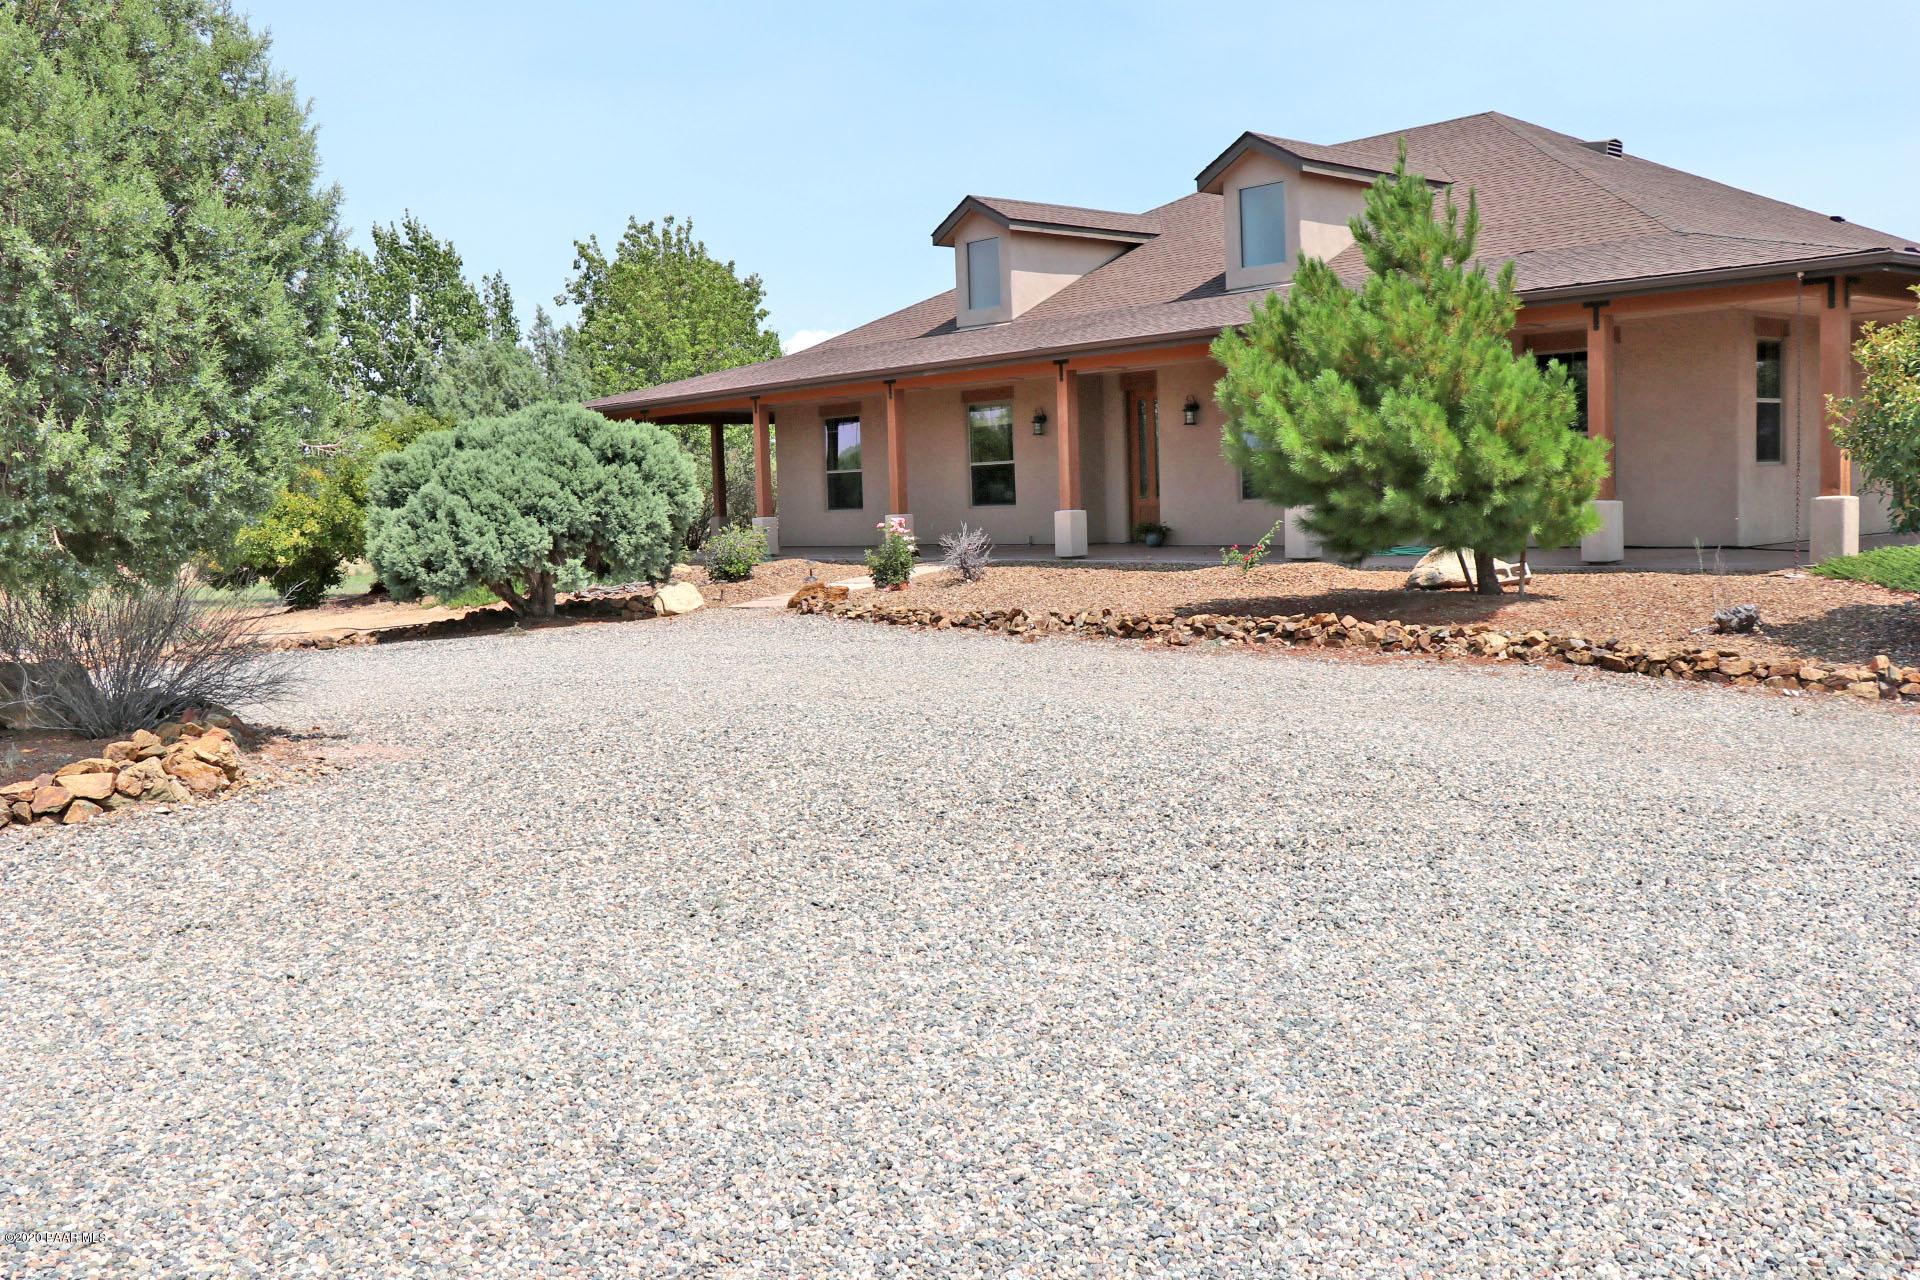 Photo of 17001 Crossroads Ranch, Prescott, AZ 86305